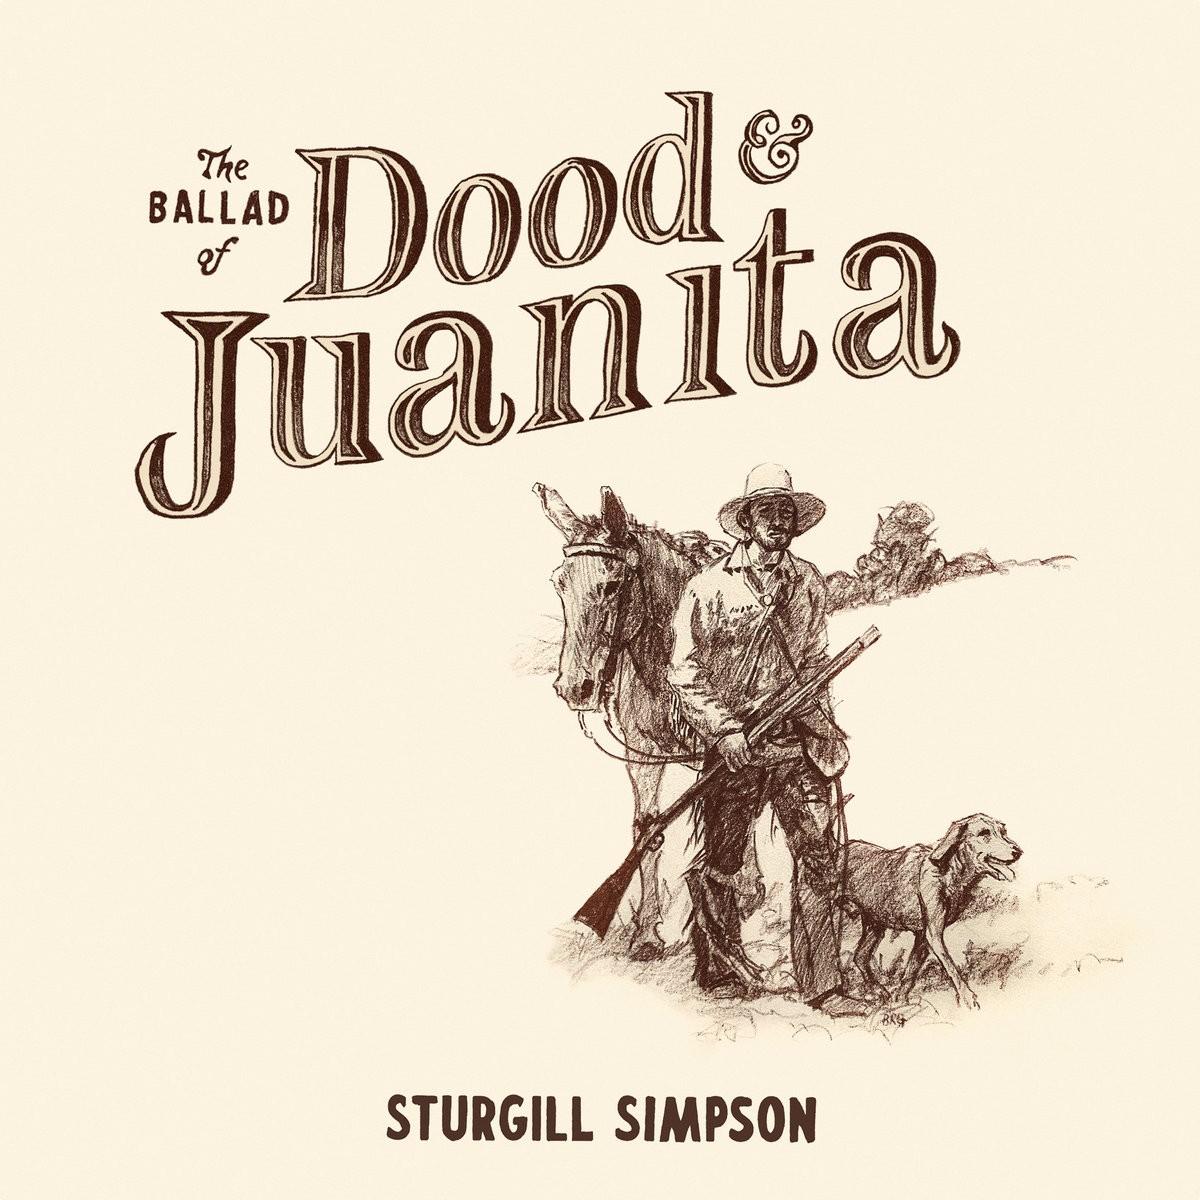 Sturgill Simpson – The Ballad Of Dood & Juanita